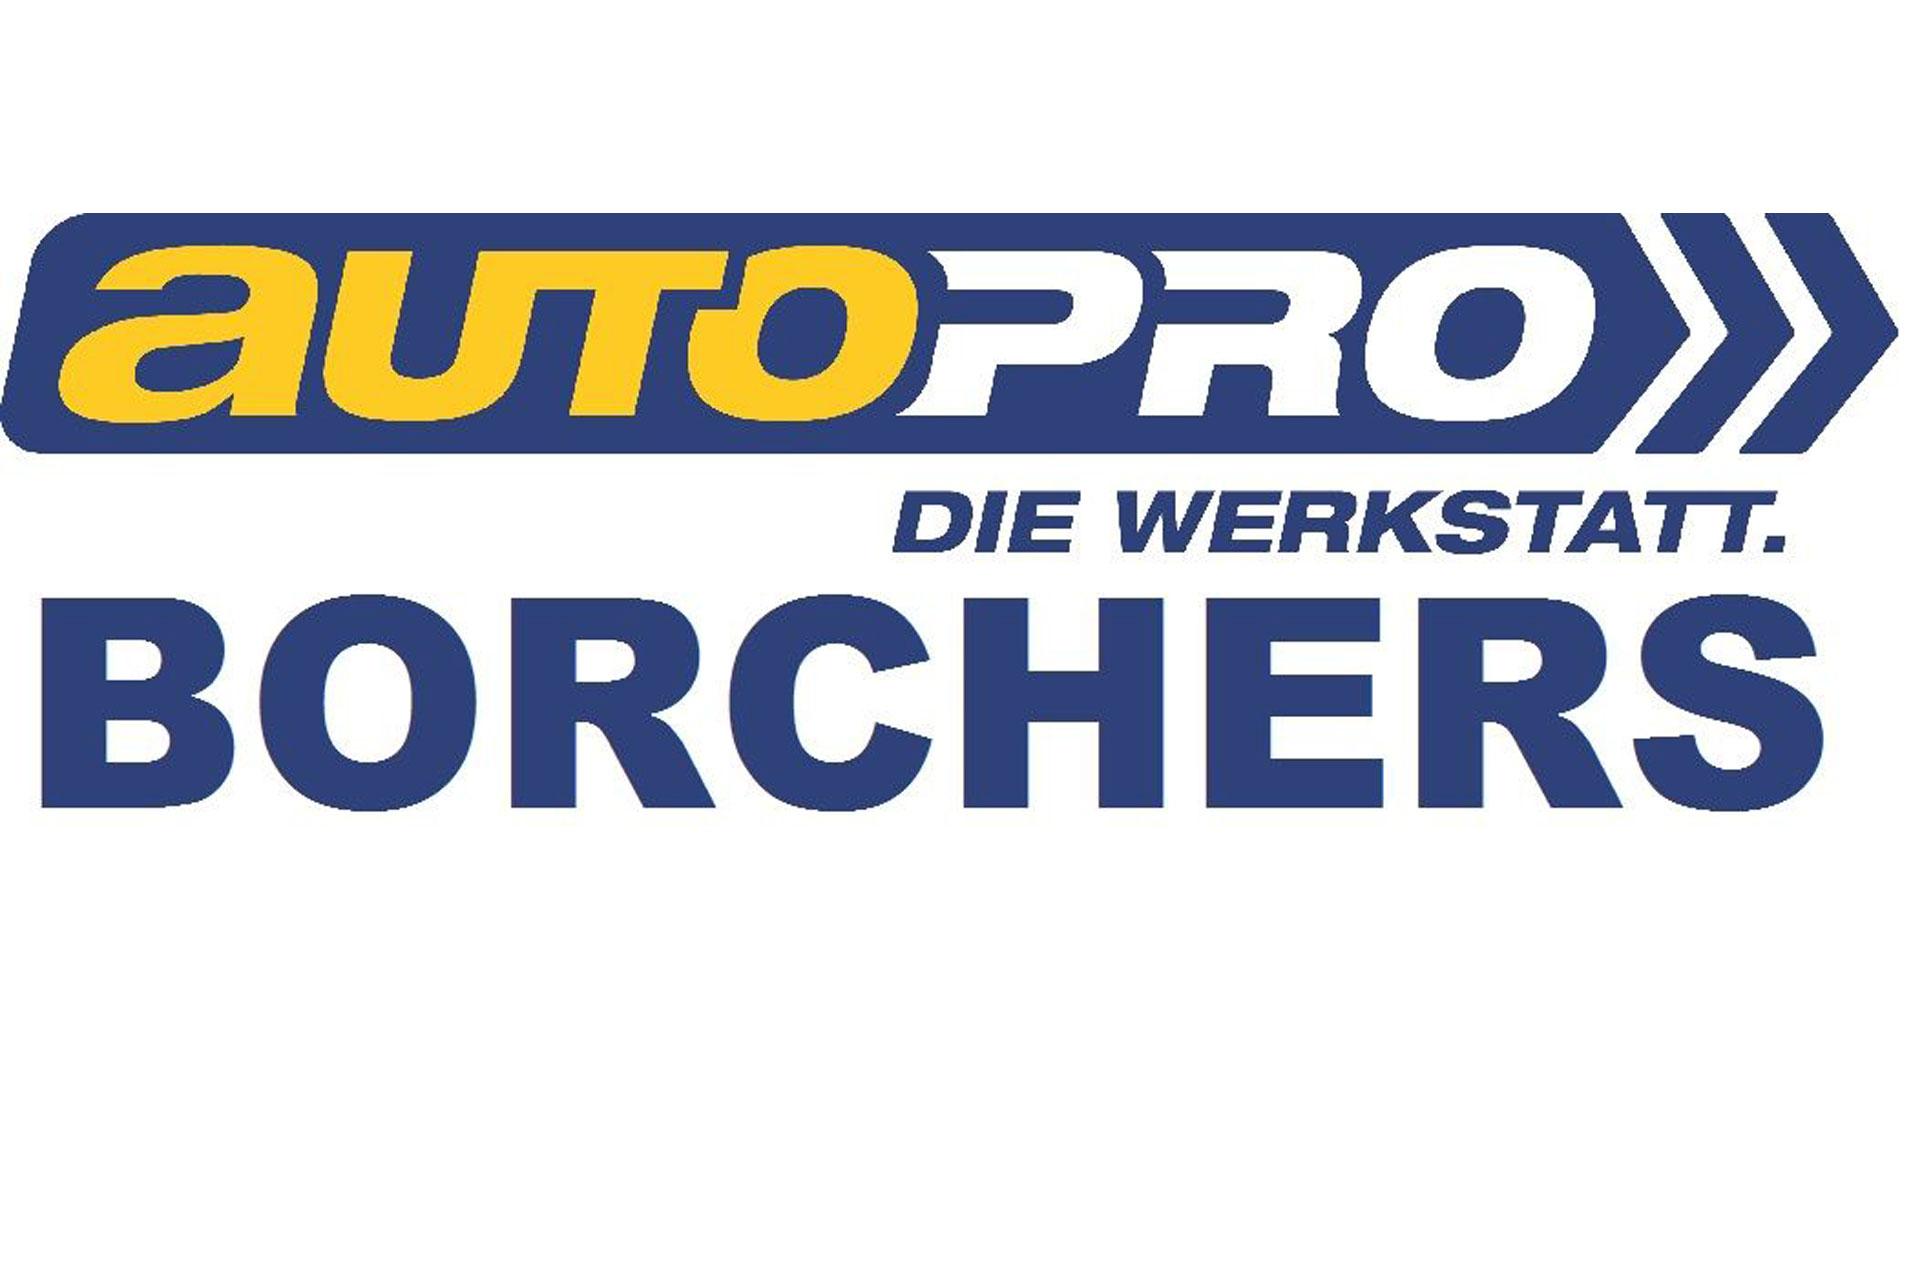 Logo Borchers GmbH, Kfz-Meisterbetrieb